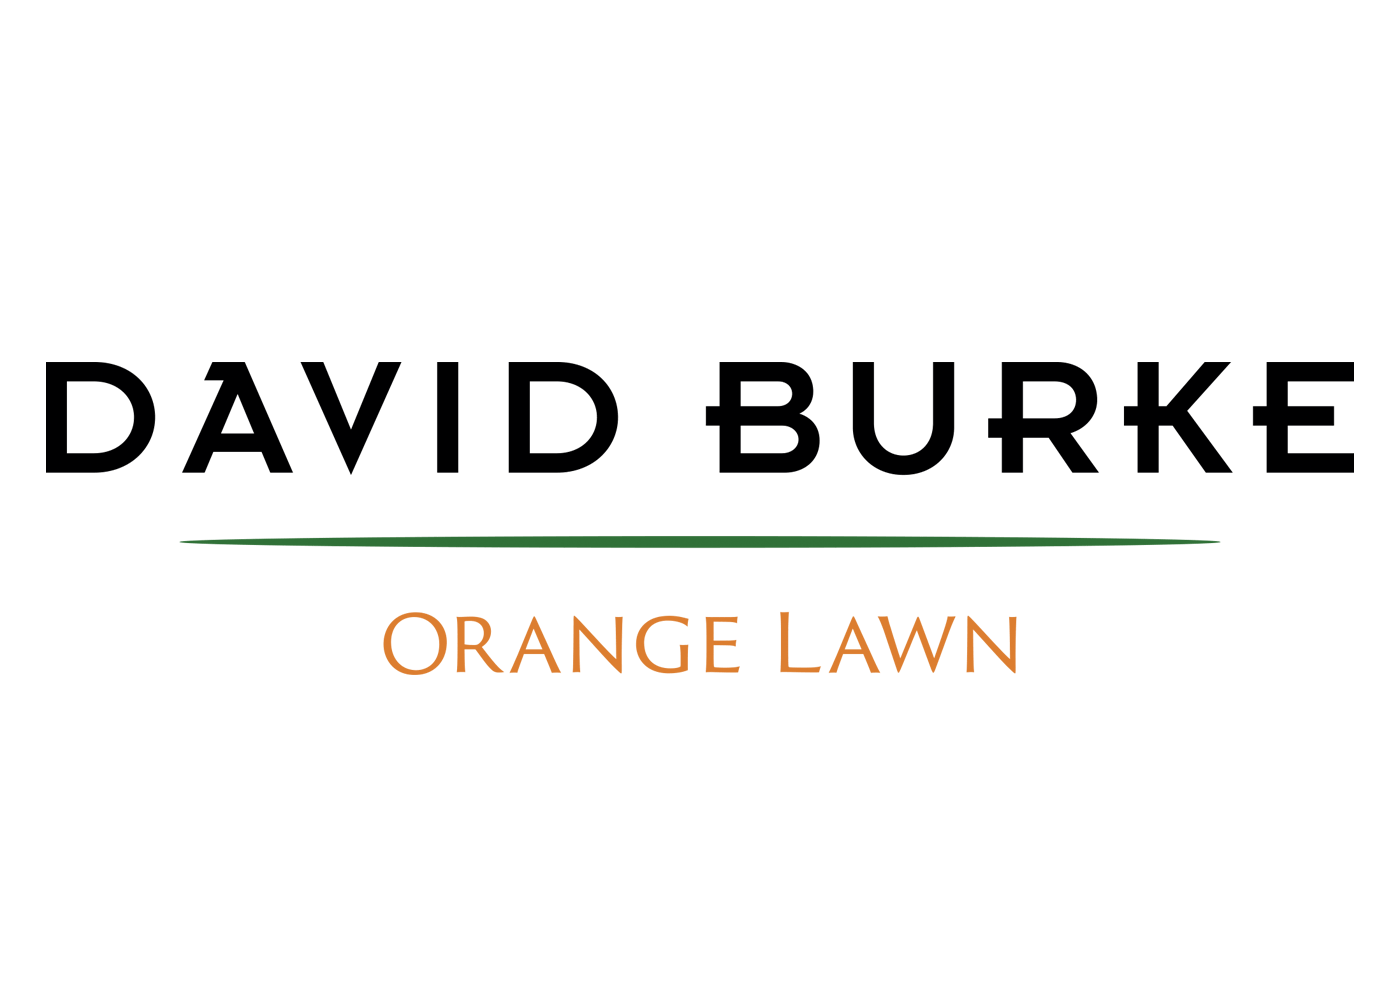 David Burke Orange Lawn logo